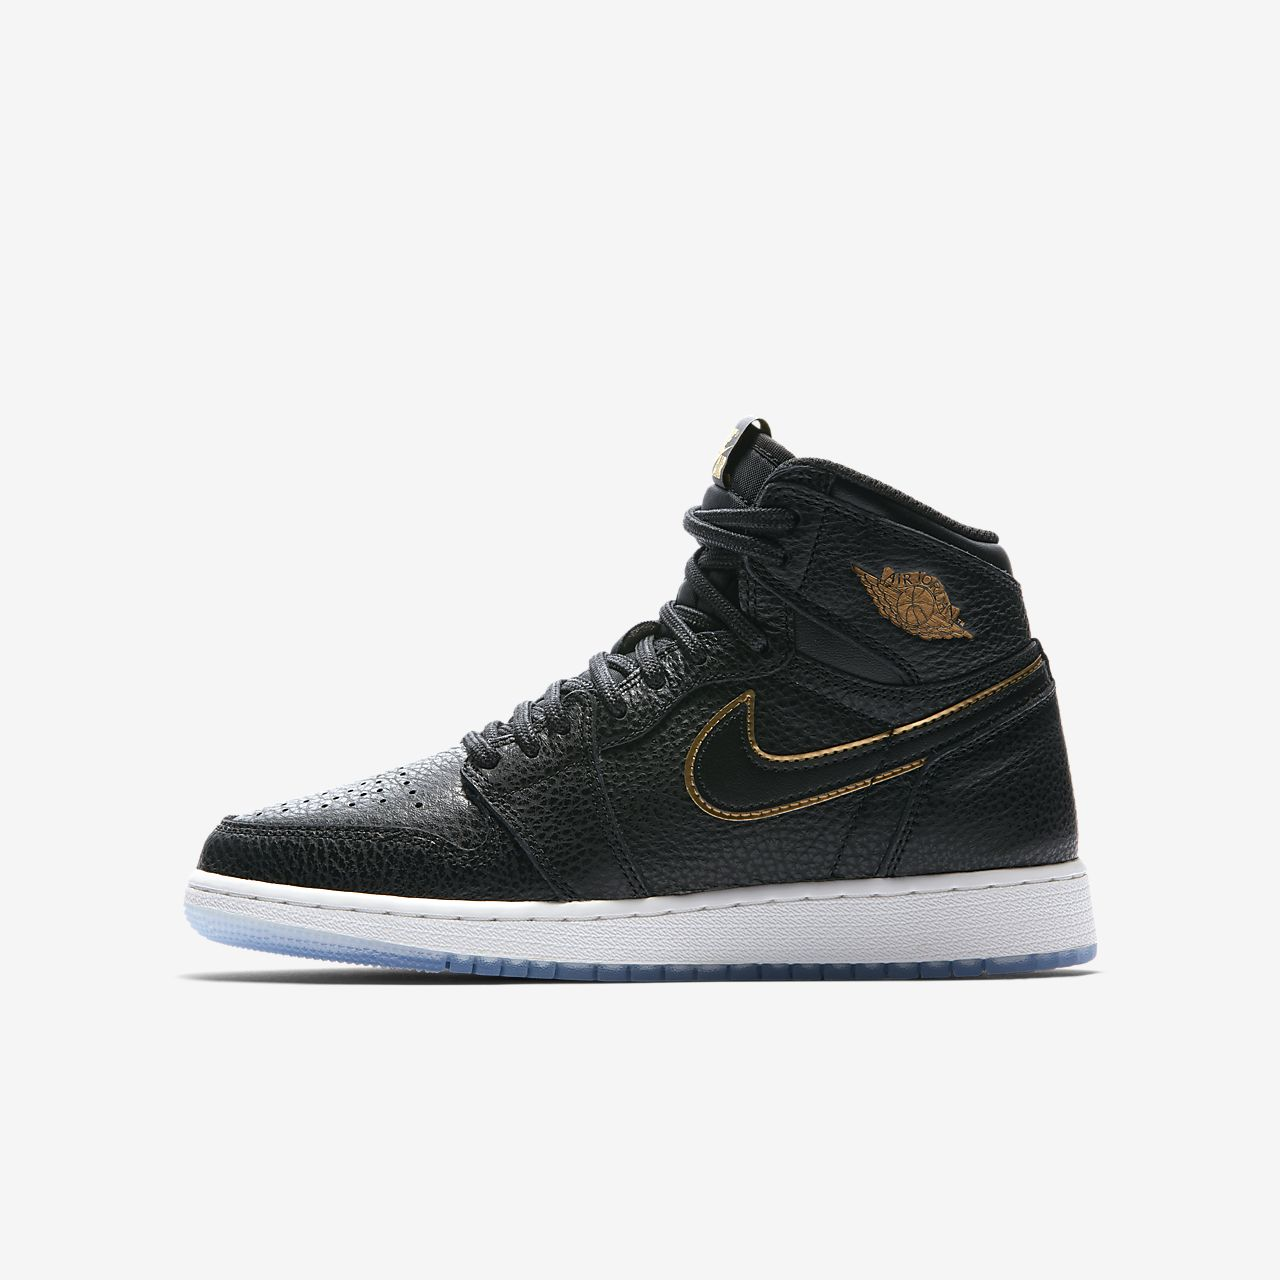 Nike Air Jordan 1 Retro High Top Sneaker Scarpe da ginnastica PELLE NERO OFFERTA